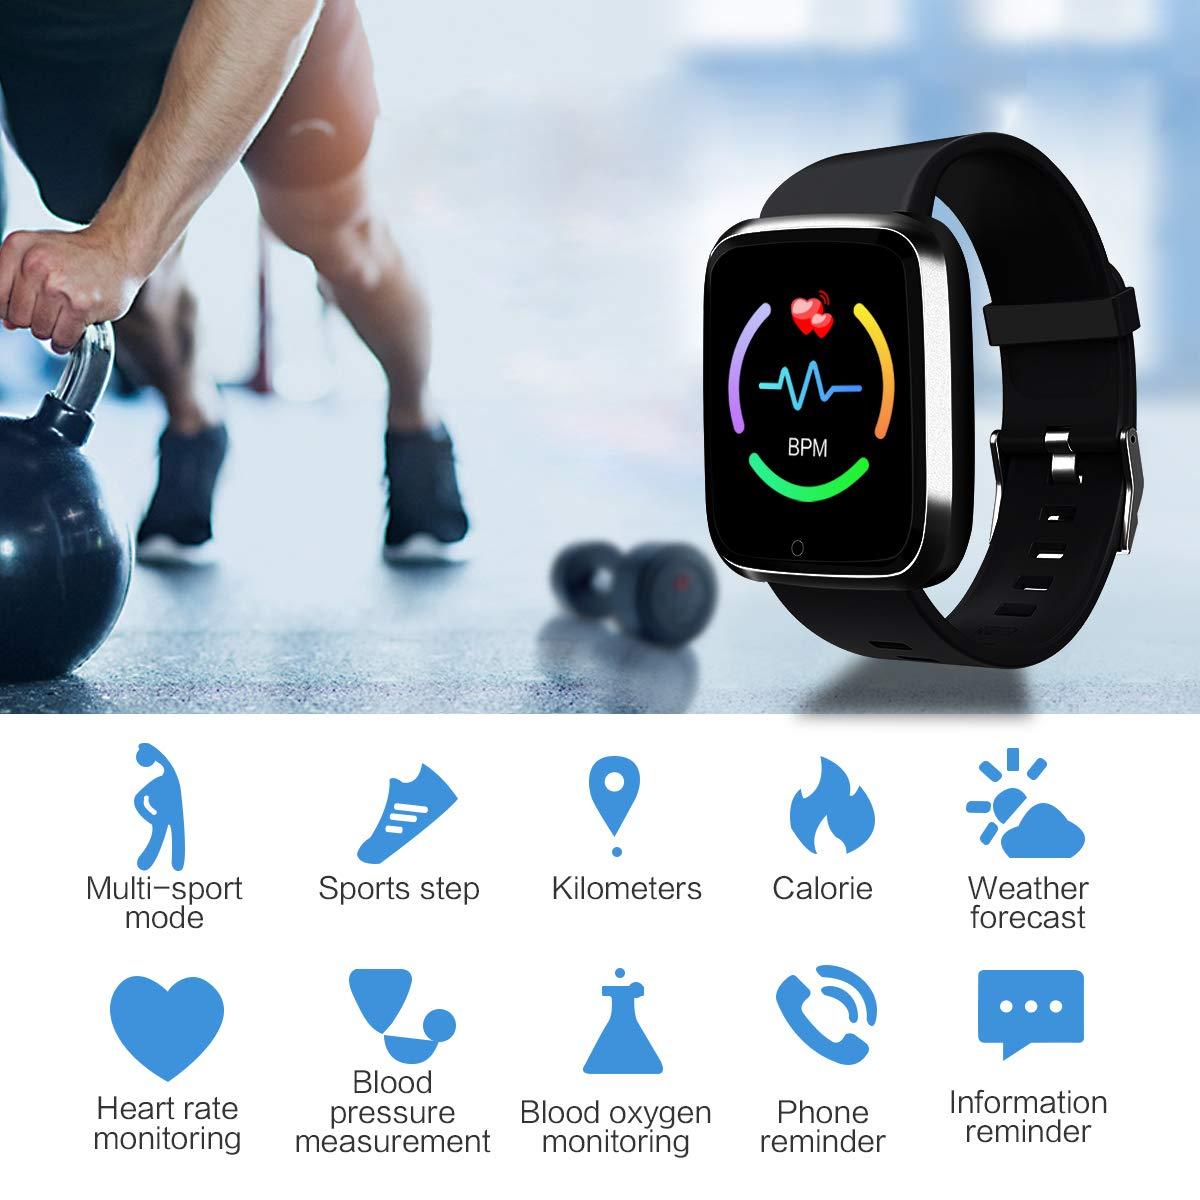 Amazon.com: Reloj inteligente, deportivo, rastreador de ...